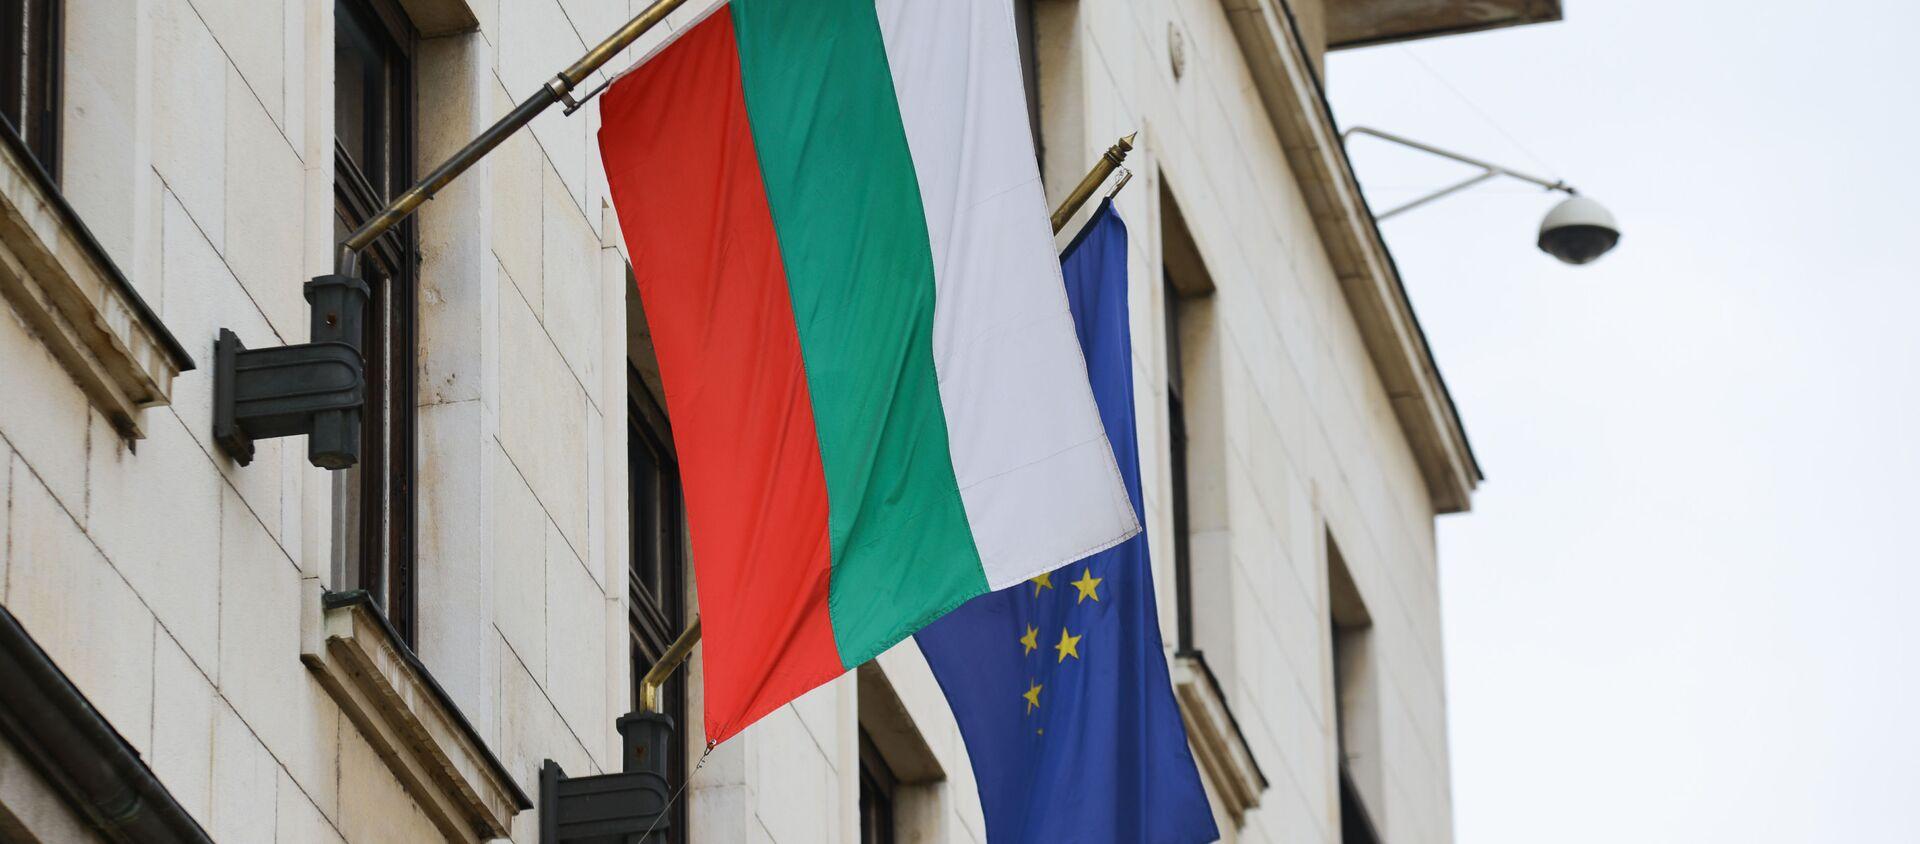 Flaga Bułgarii i UE - Sputnik Polska, 1920, 20.03.2021